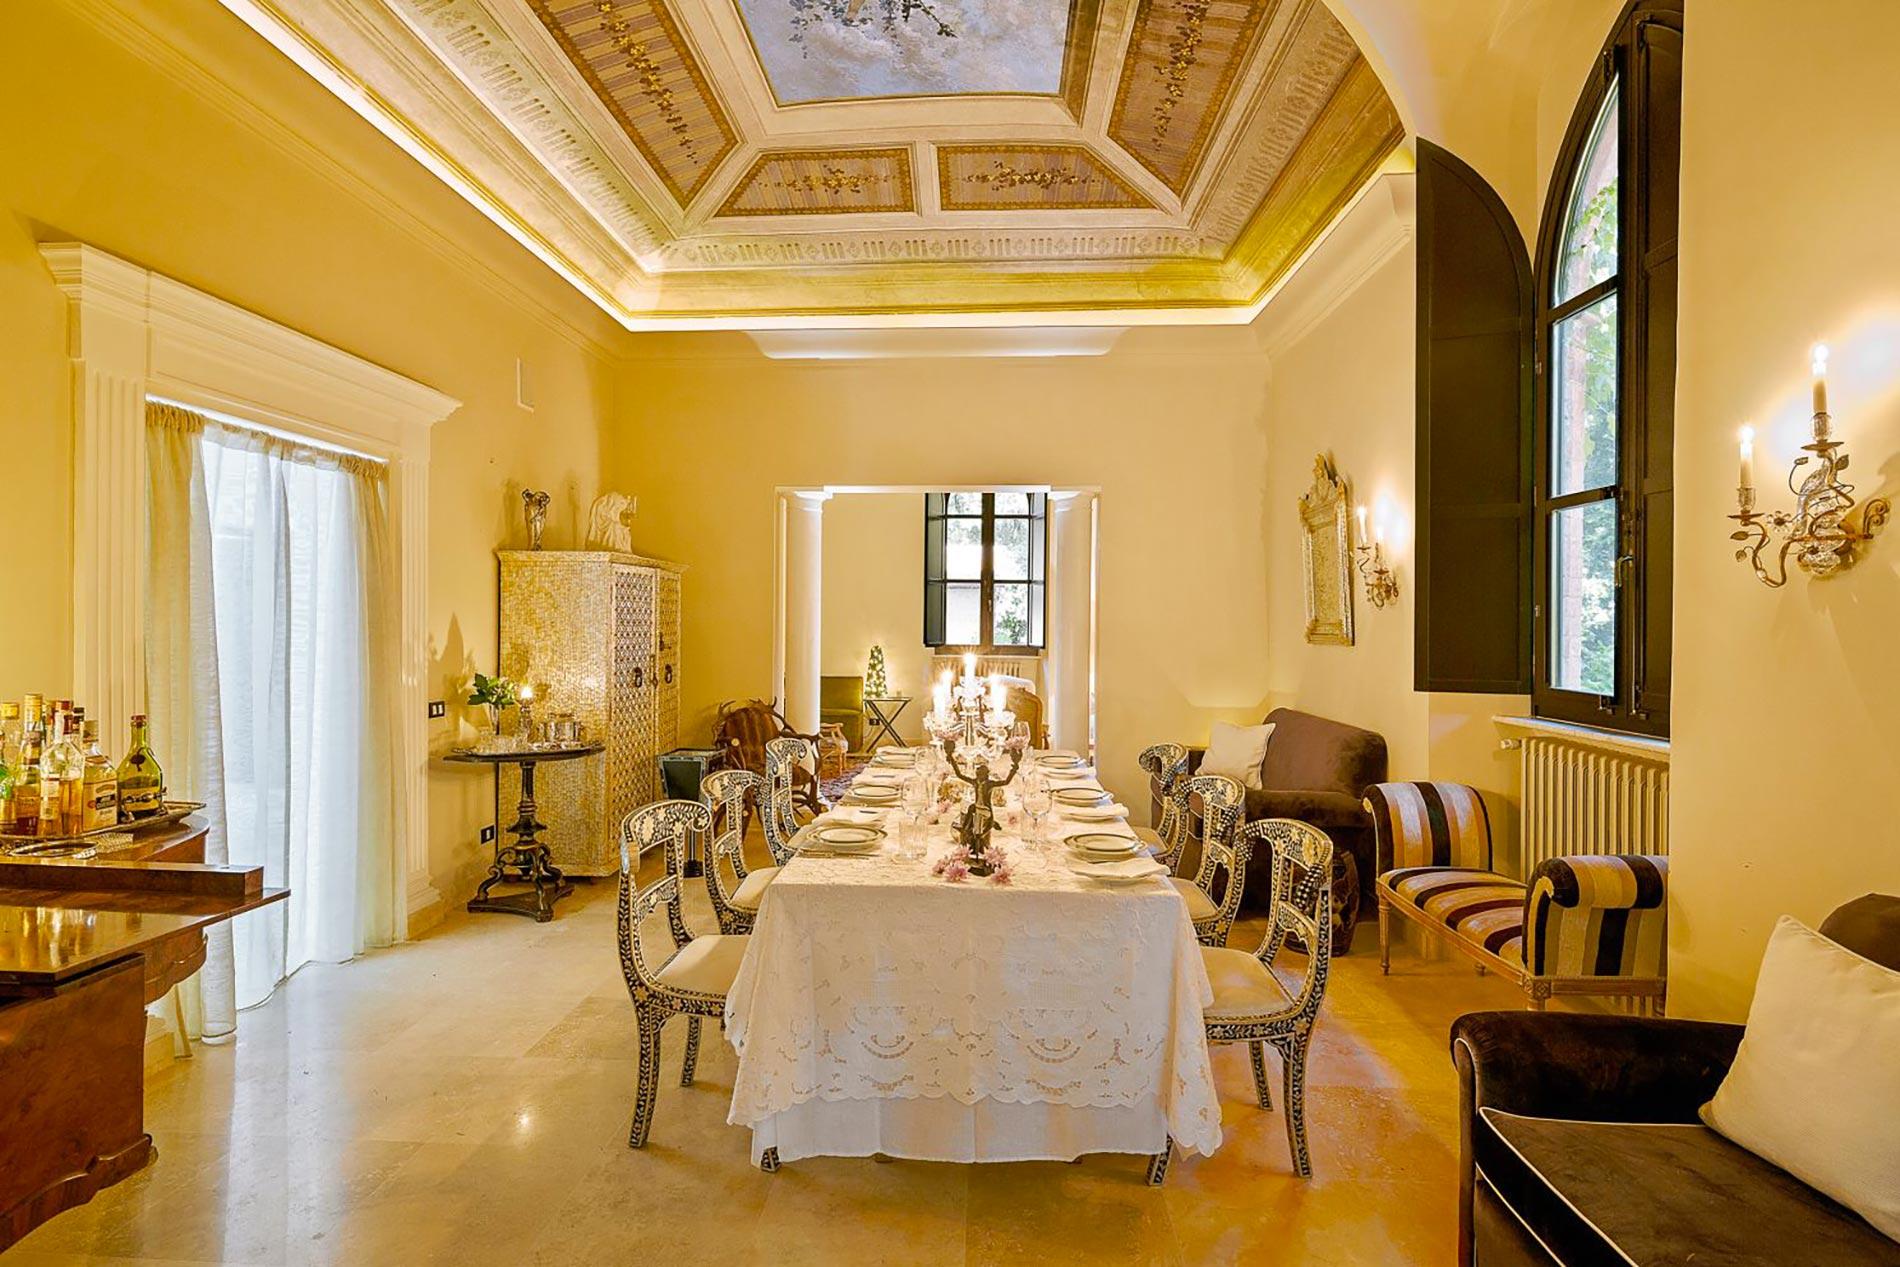 home-tour-siena-sala-da-pranzo